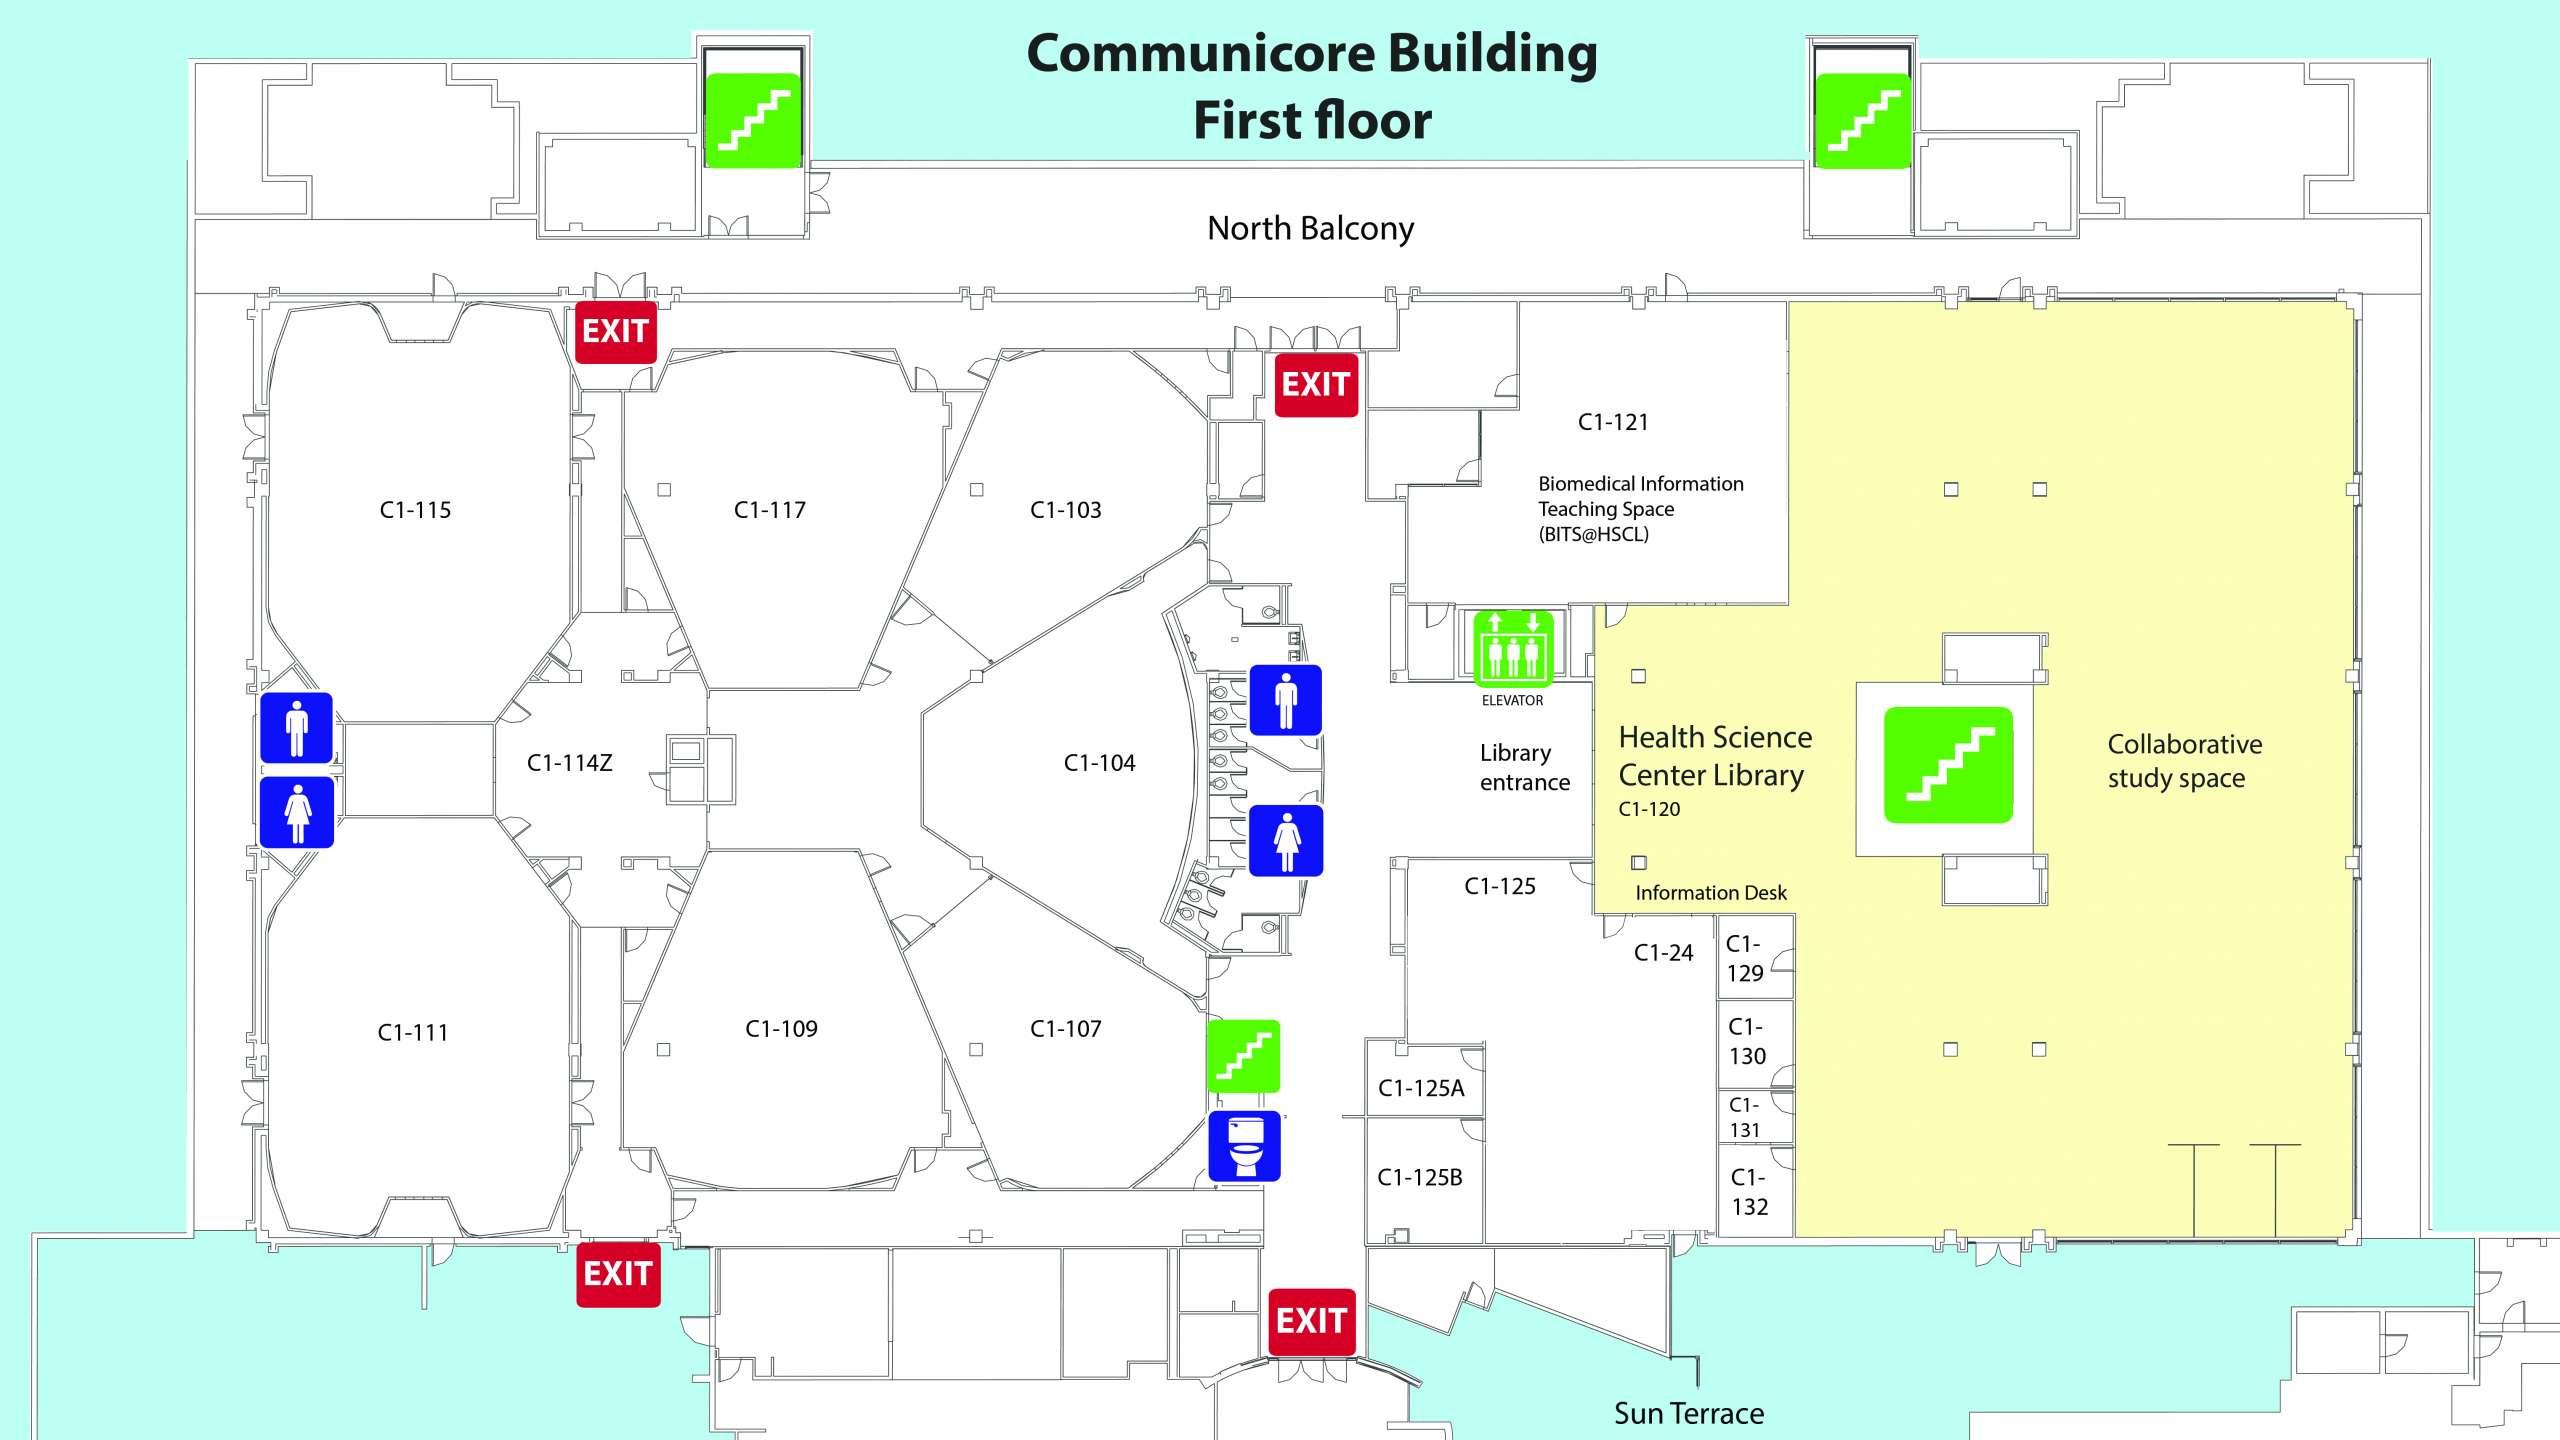 Communicore Building 1st (First) floor